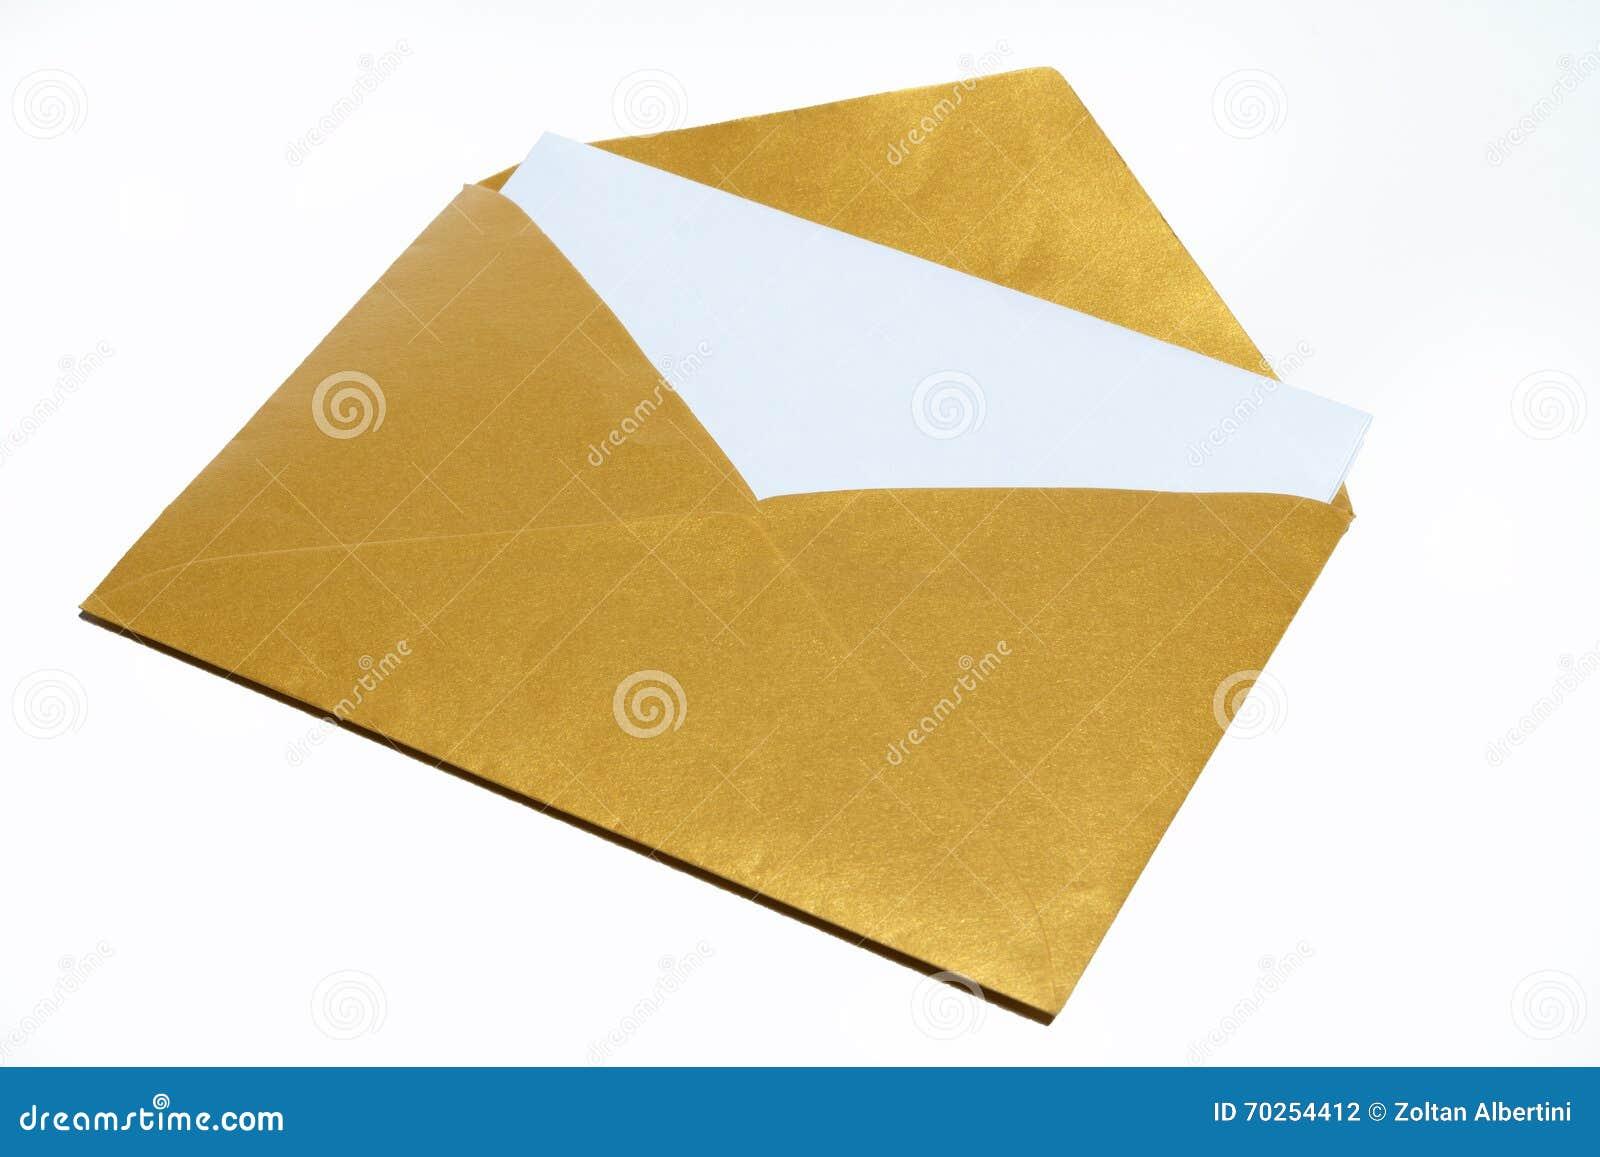 Goldumschlag